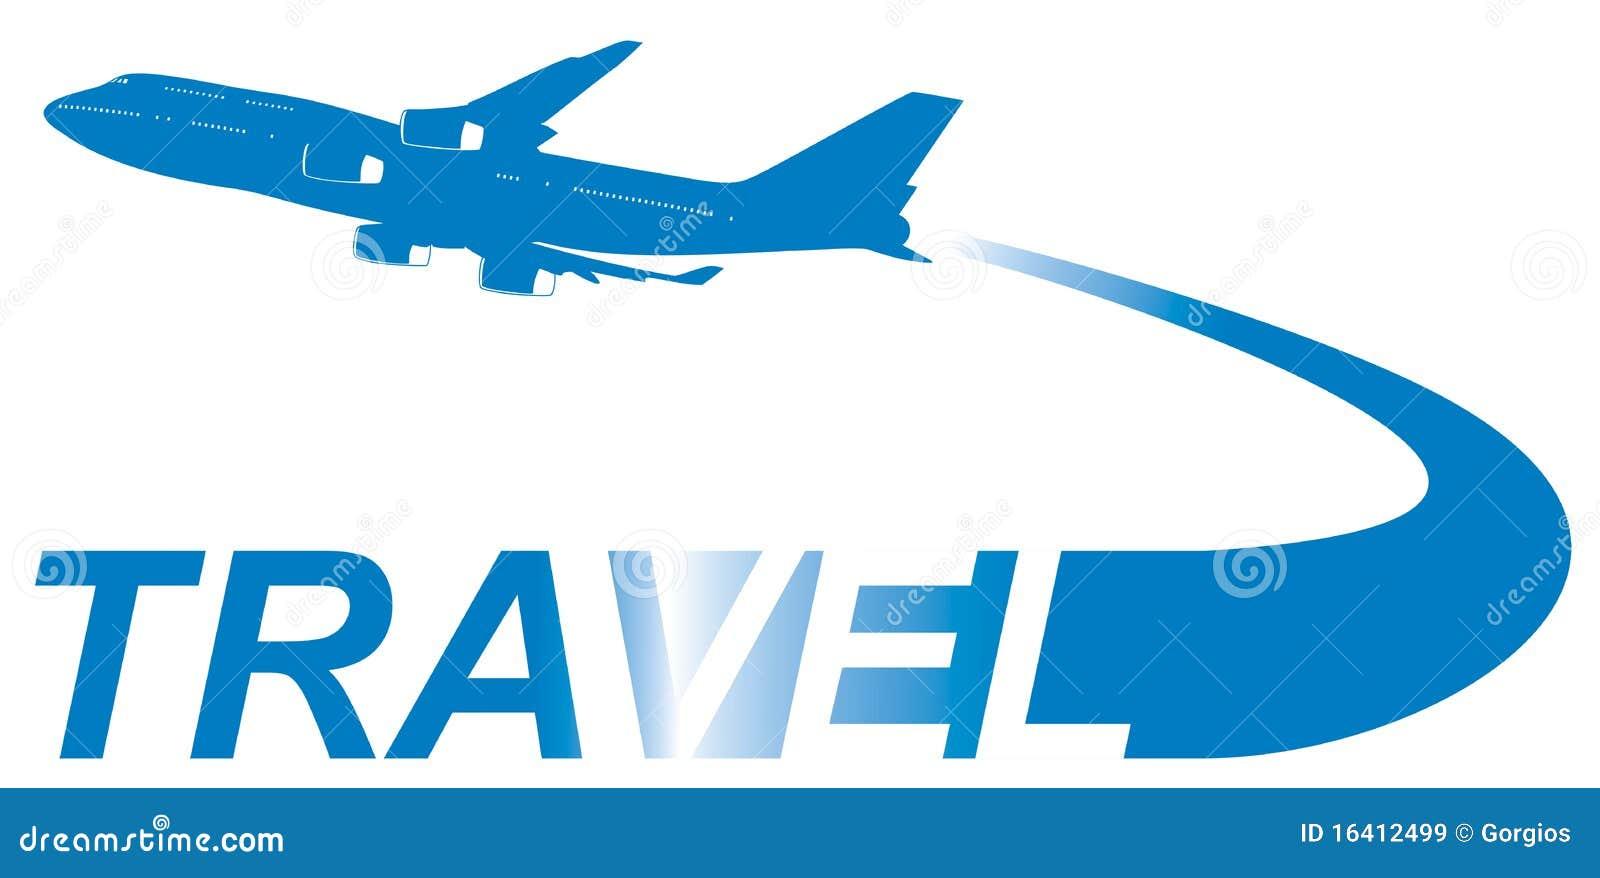 travel logo clip art - photo #8